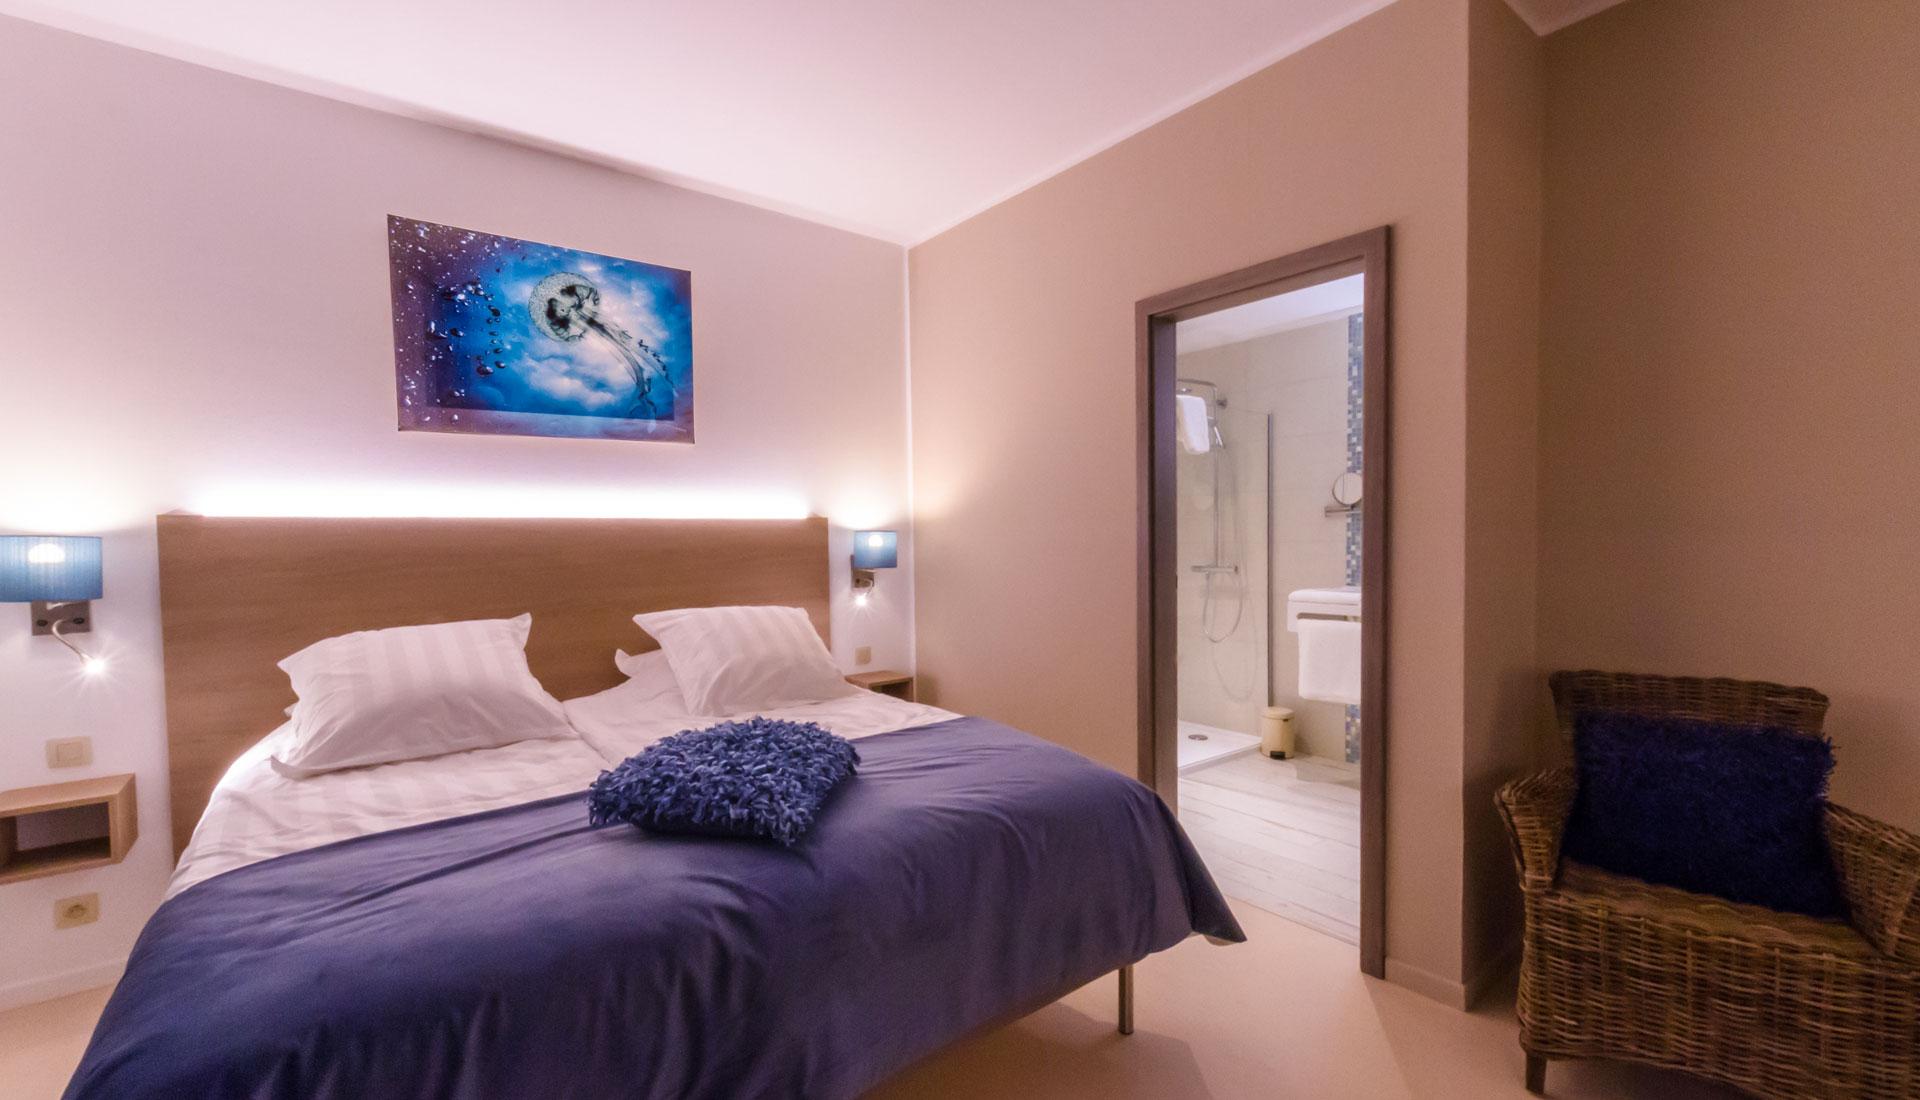 MANAVA HOTEL | Chambres modernes & services confortables ...